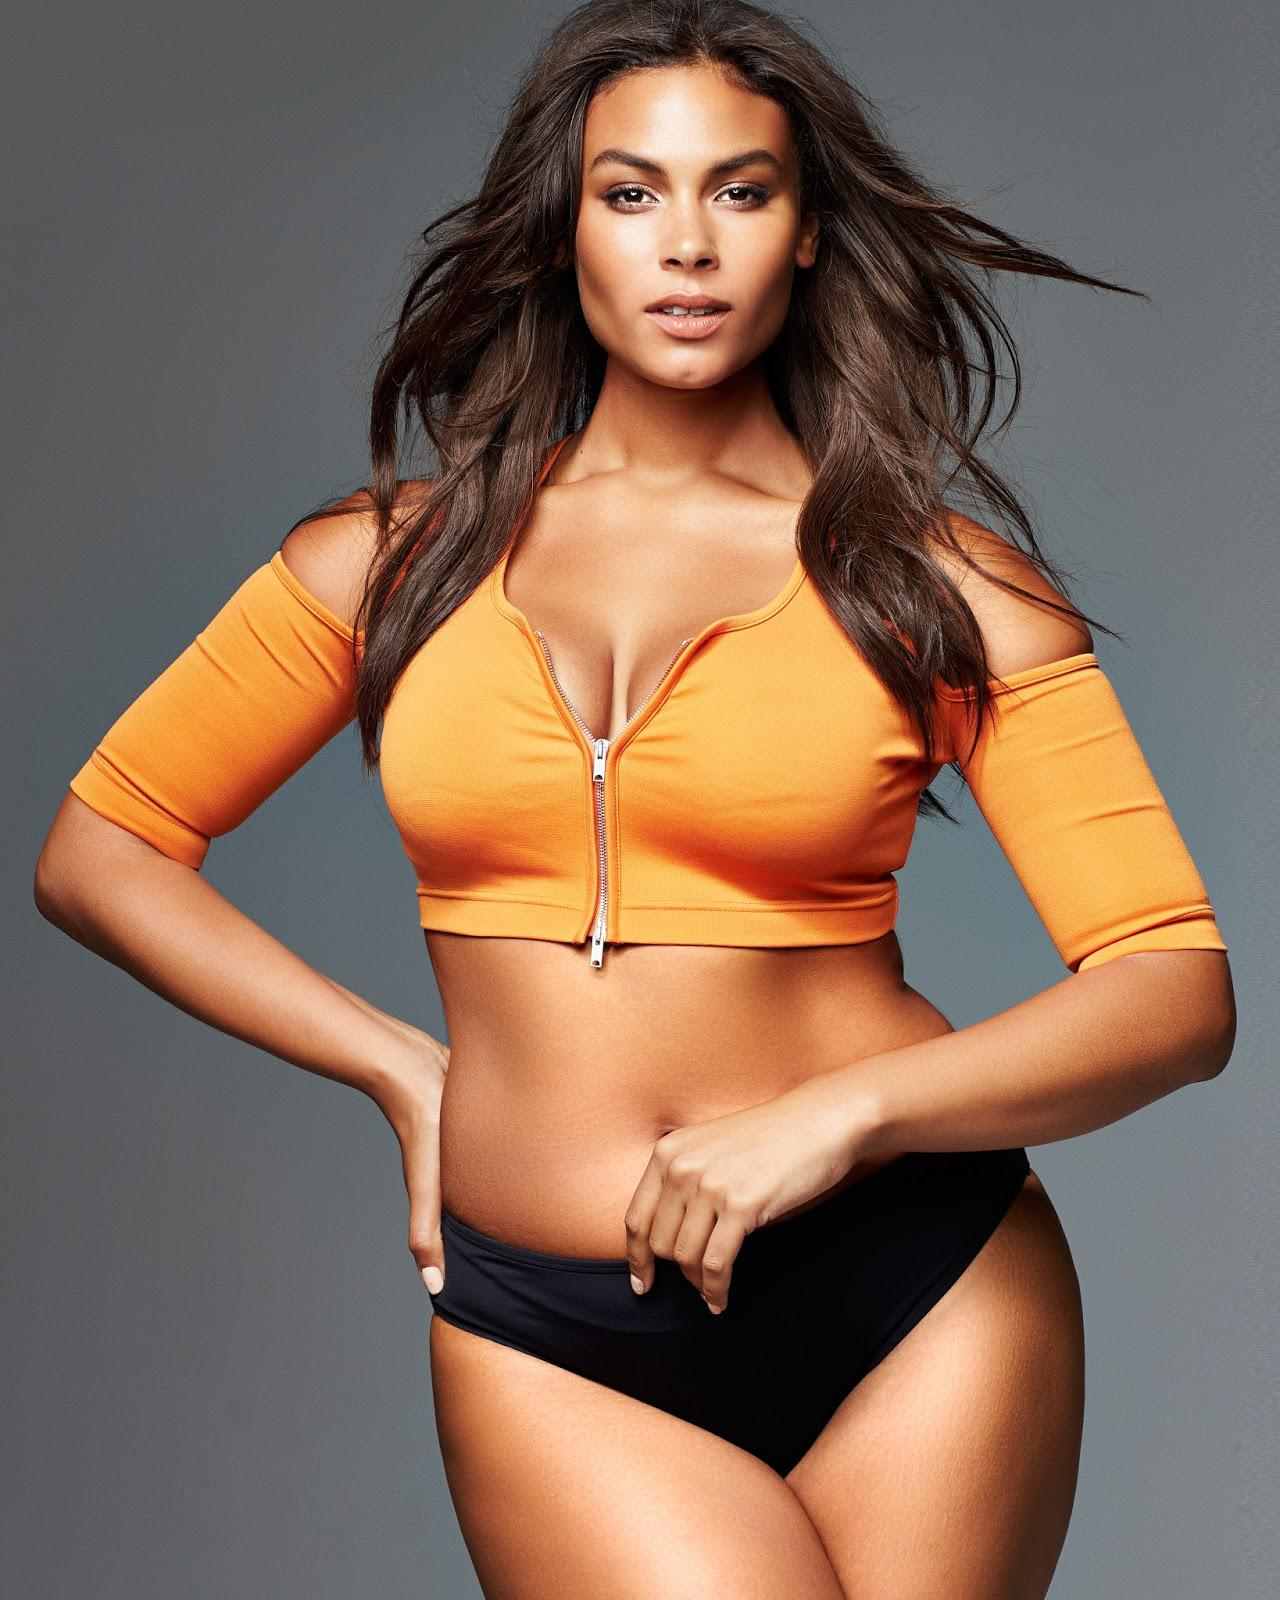 Plus Size Bikini Models - Marquita Pring